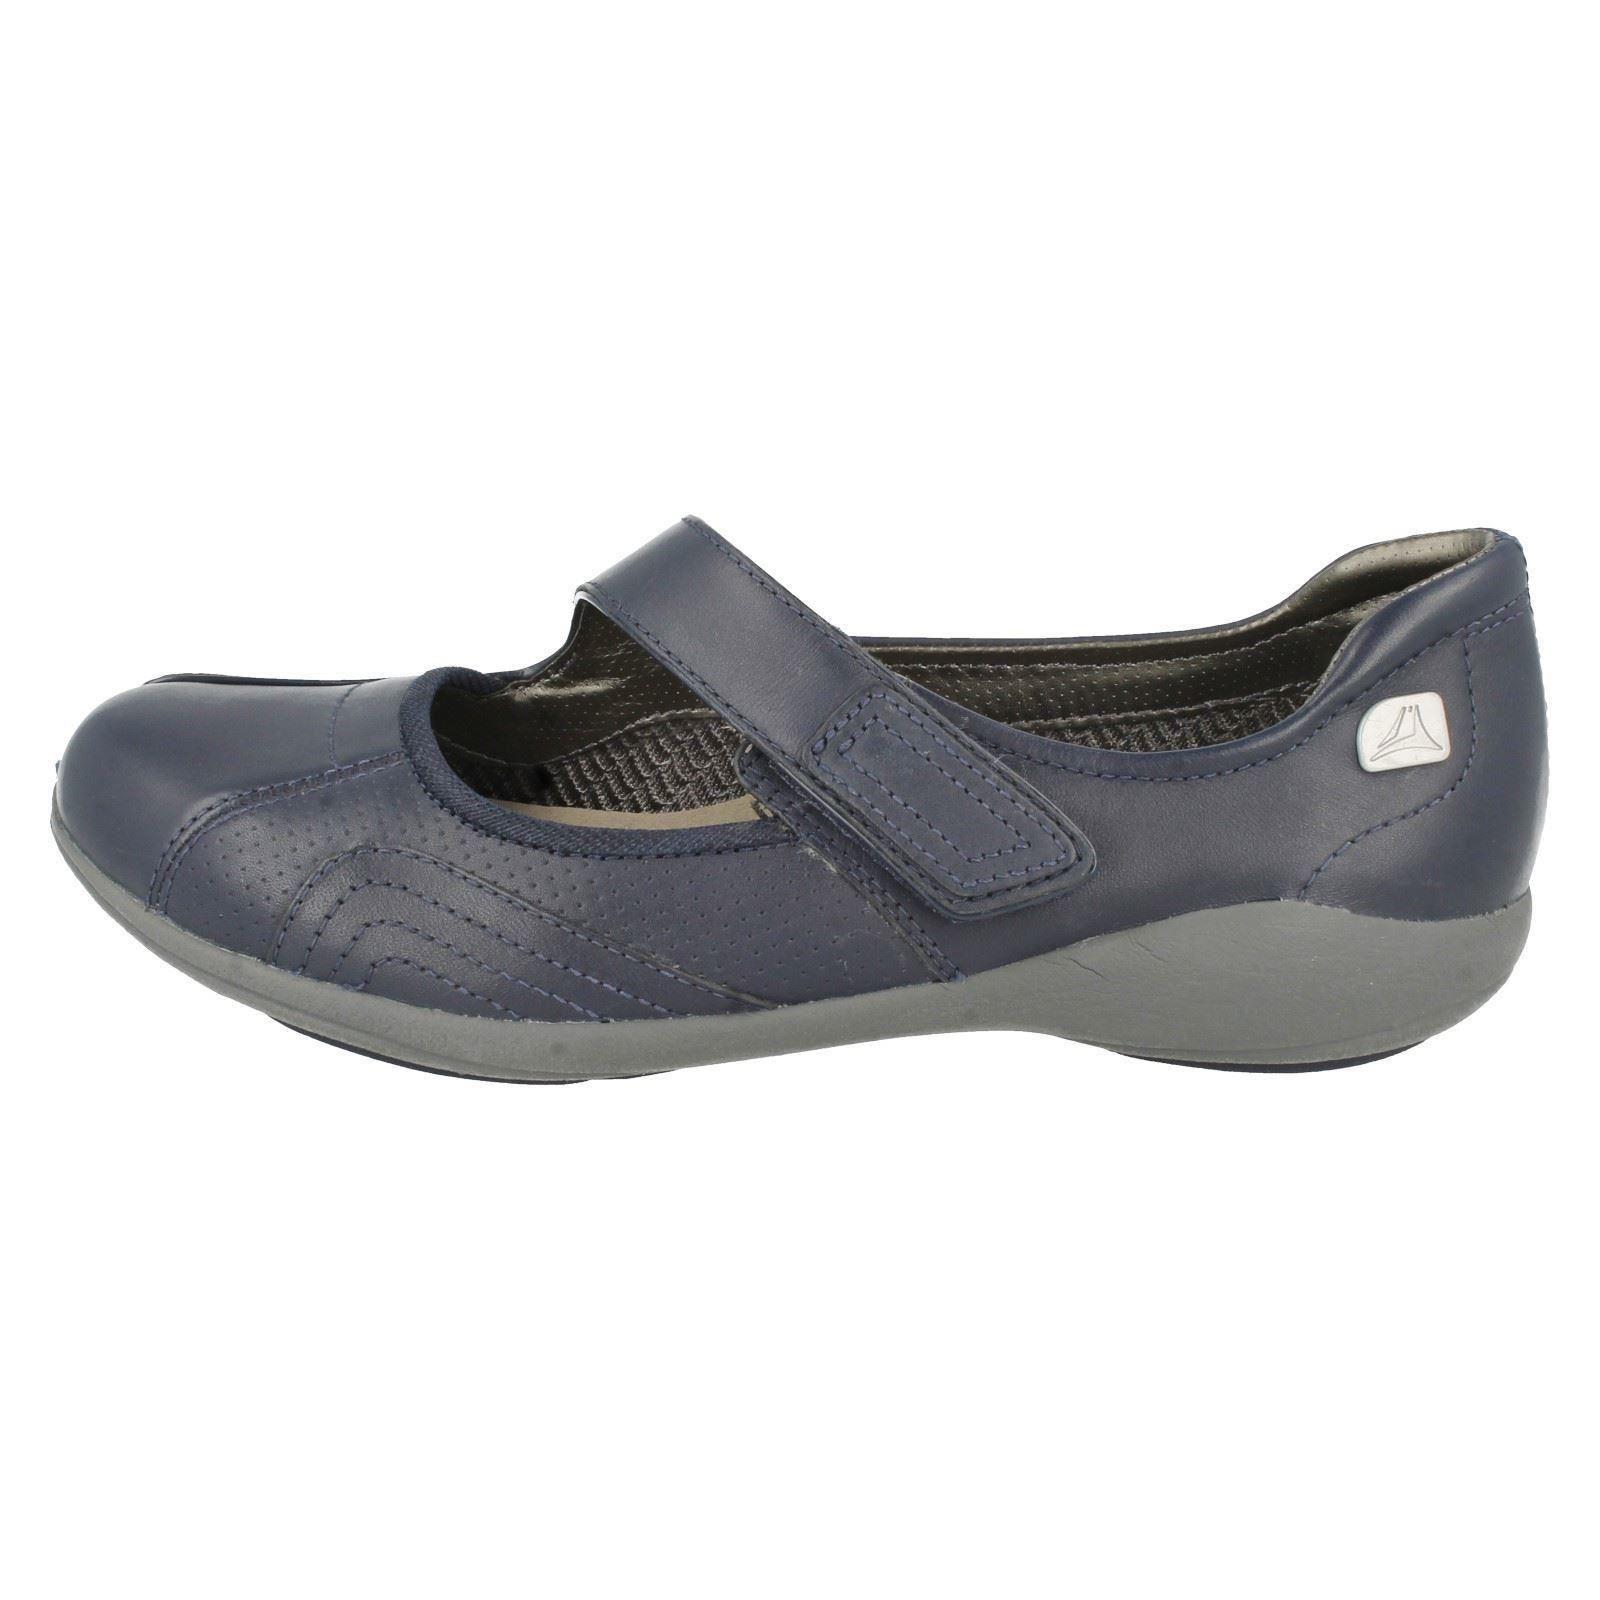 Clarks Indigo Bar Shoes